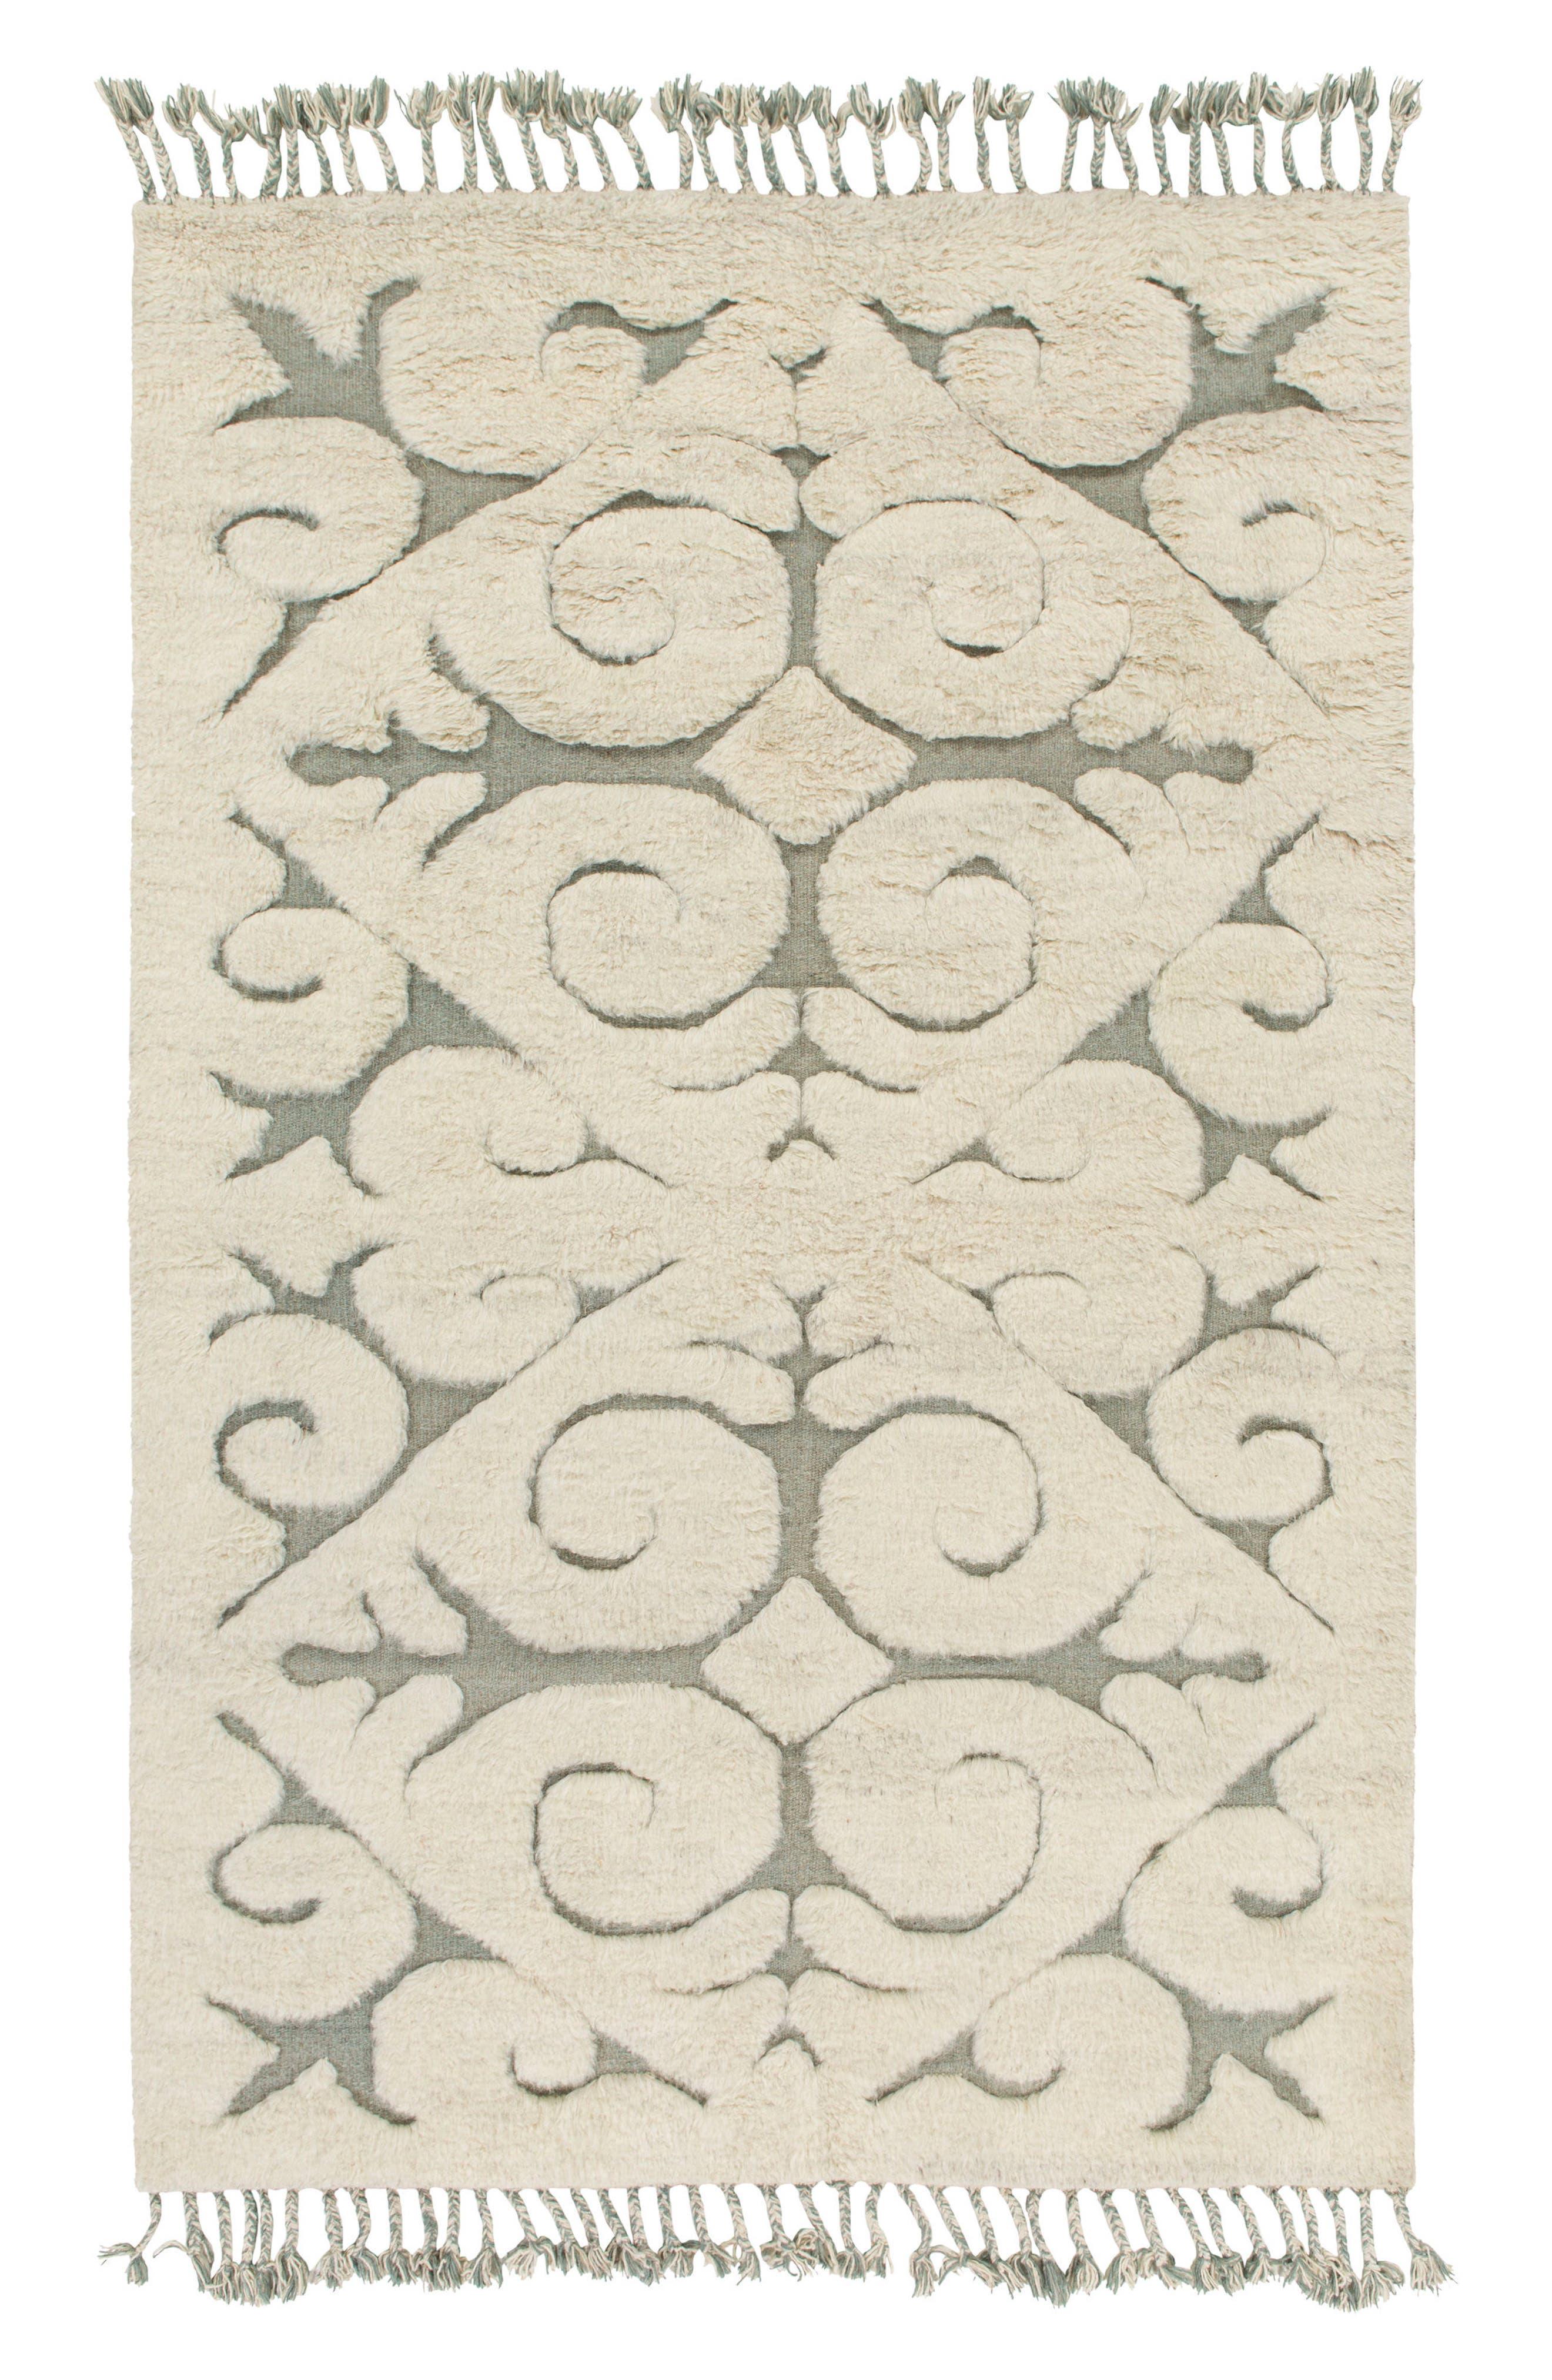 Chloe Tassels Wool Rug,                         Main,                         color, Cream/ Grey